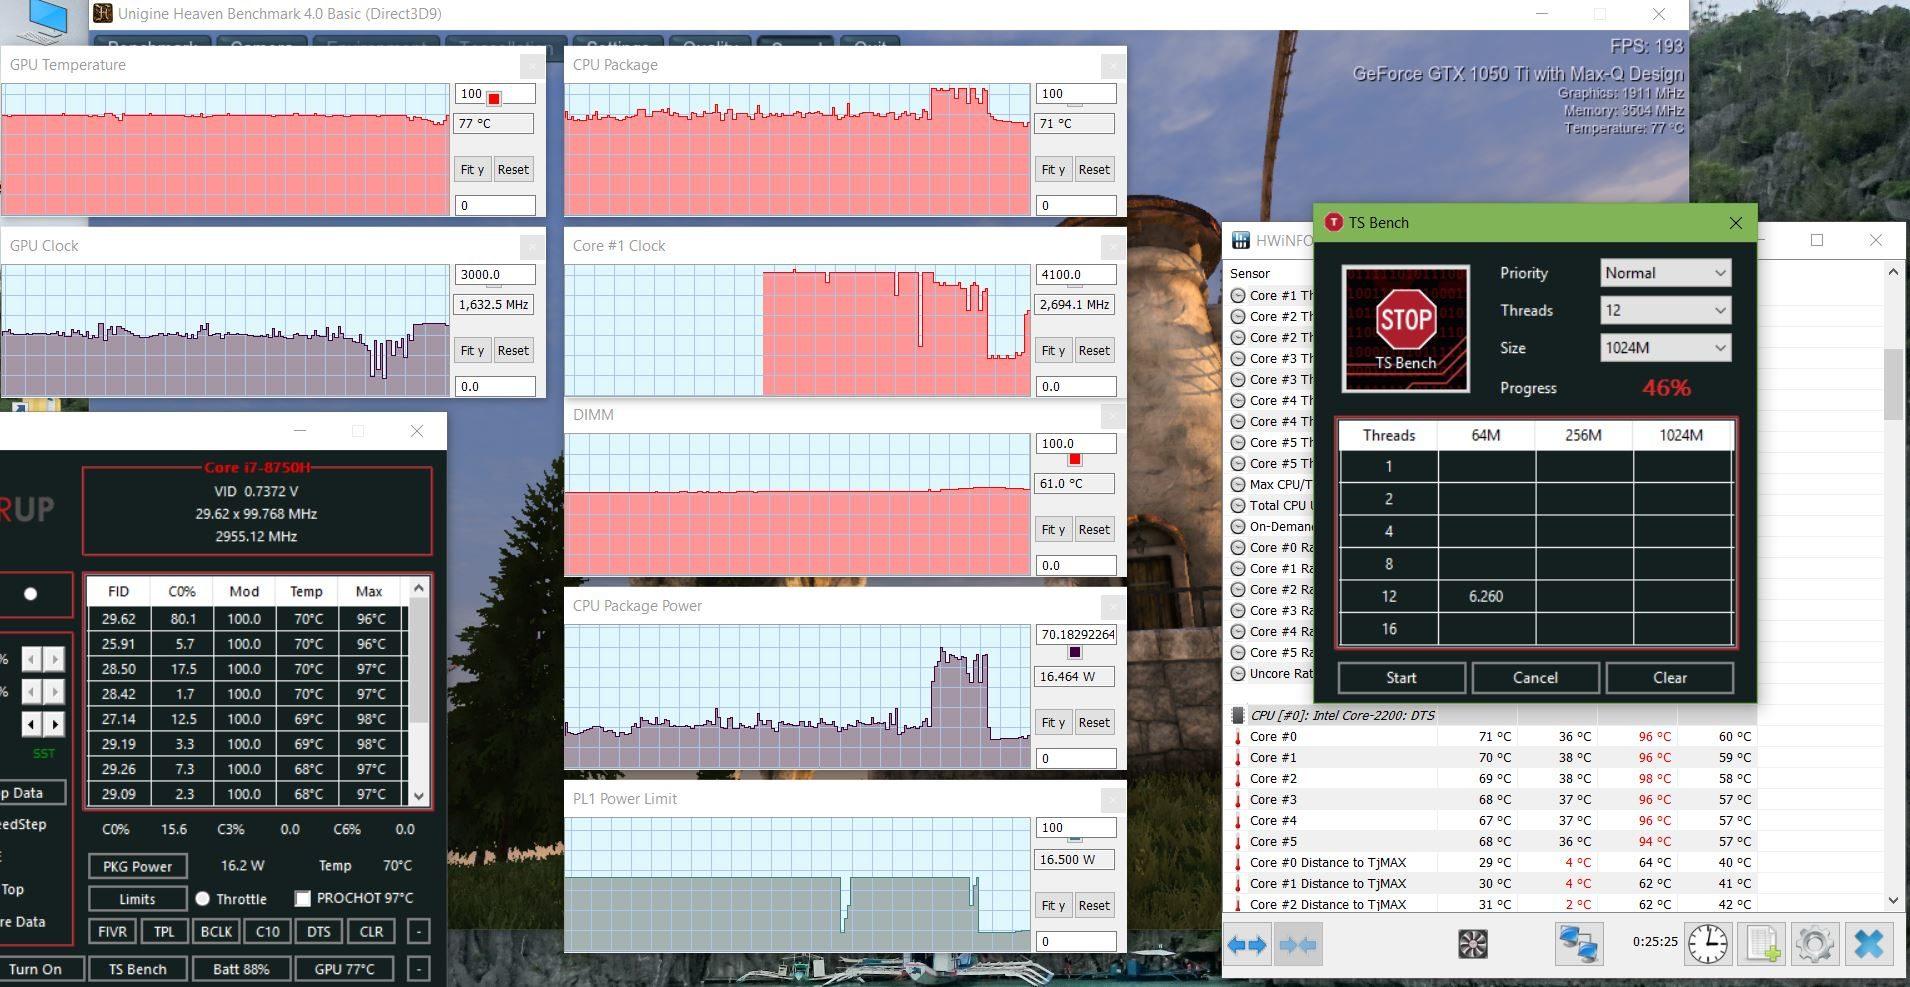 Dell XPS 15 9570 review (i7-8750H, GTX 1050 Ti Max-Q, FHD